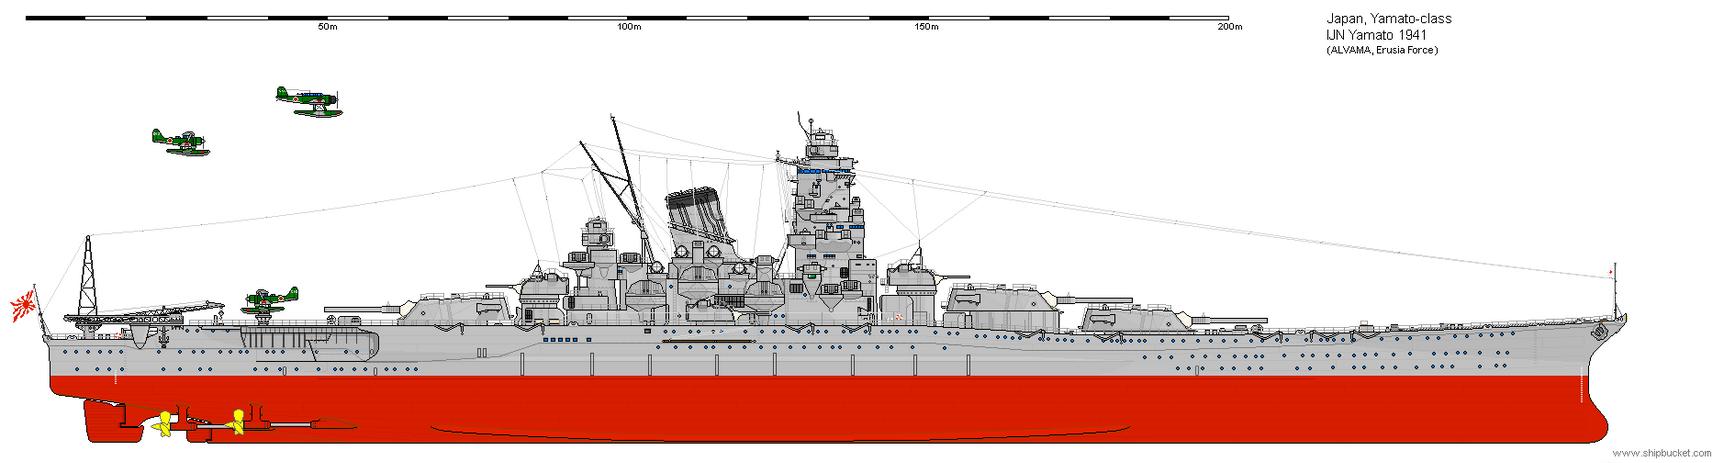 IJN Yamato 1941 by Erusia-Force on DeviantArt